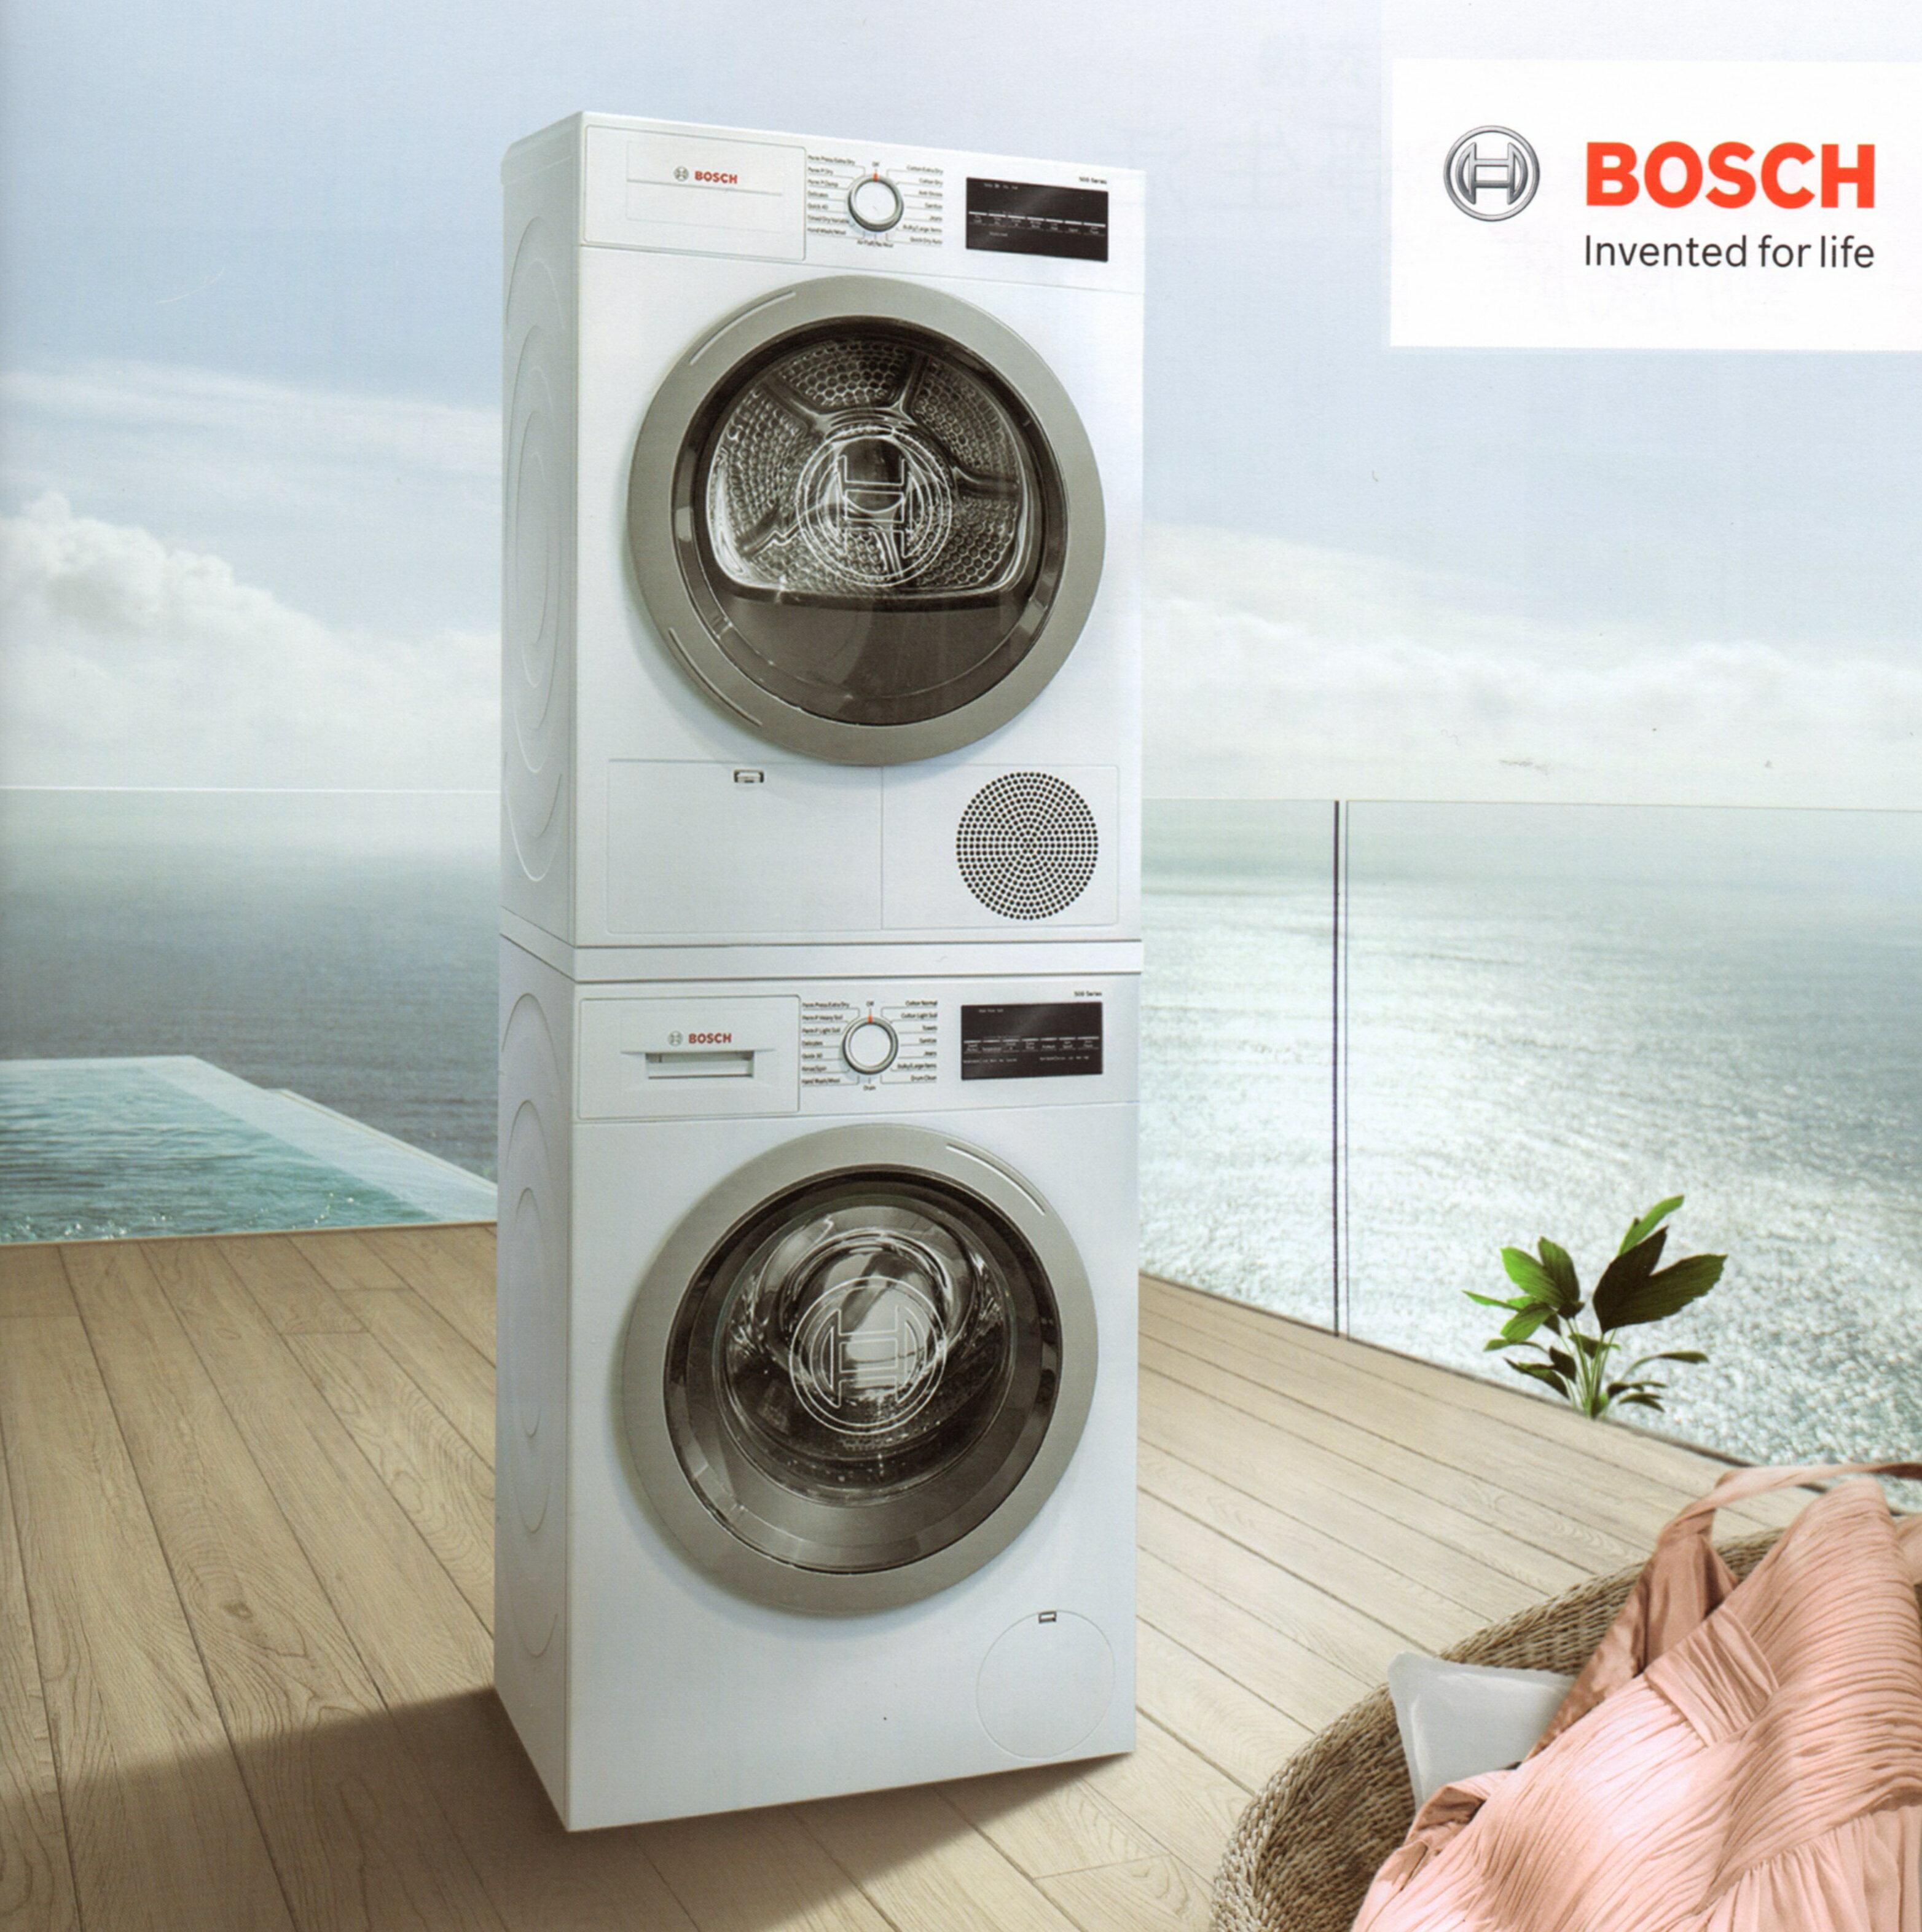 BOSCH 博世 滾筒洗衣機 WAT28401TC+ WTG86401TC 冷凝式乾衣機 ※熱線 07-7428010